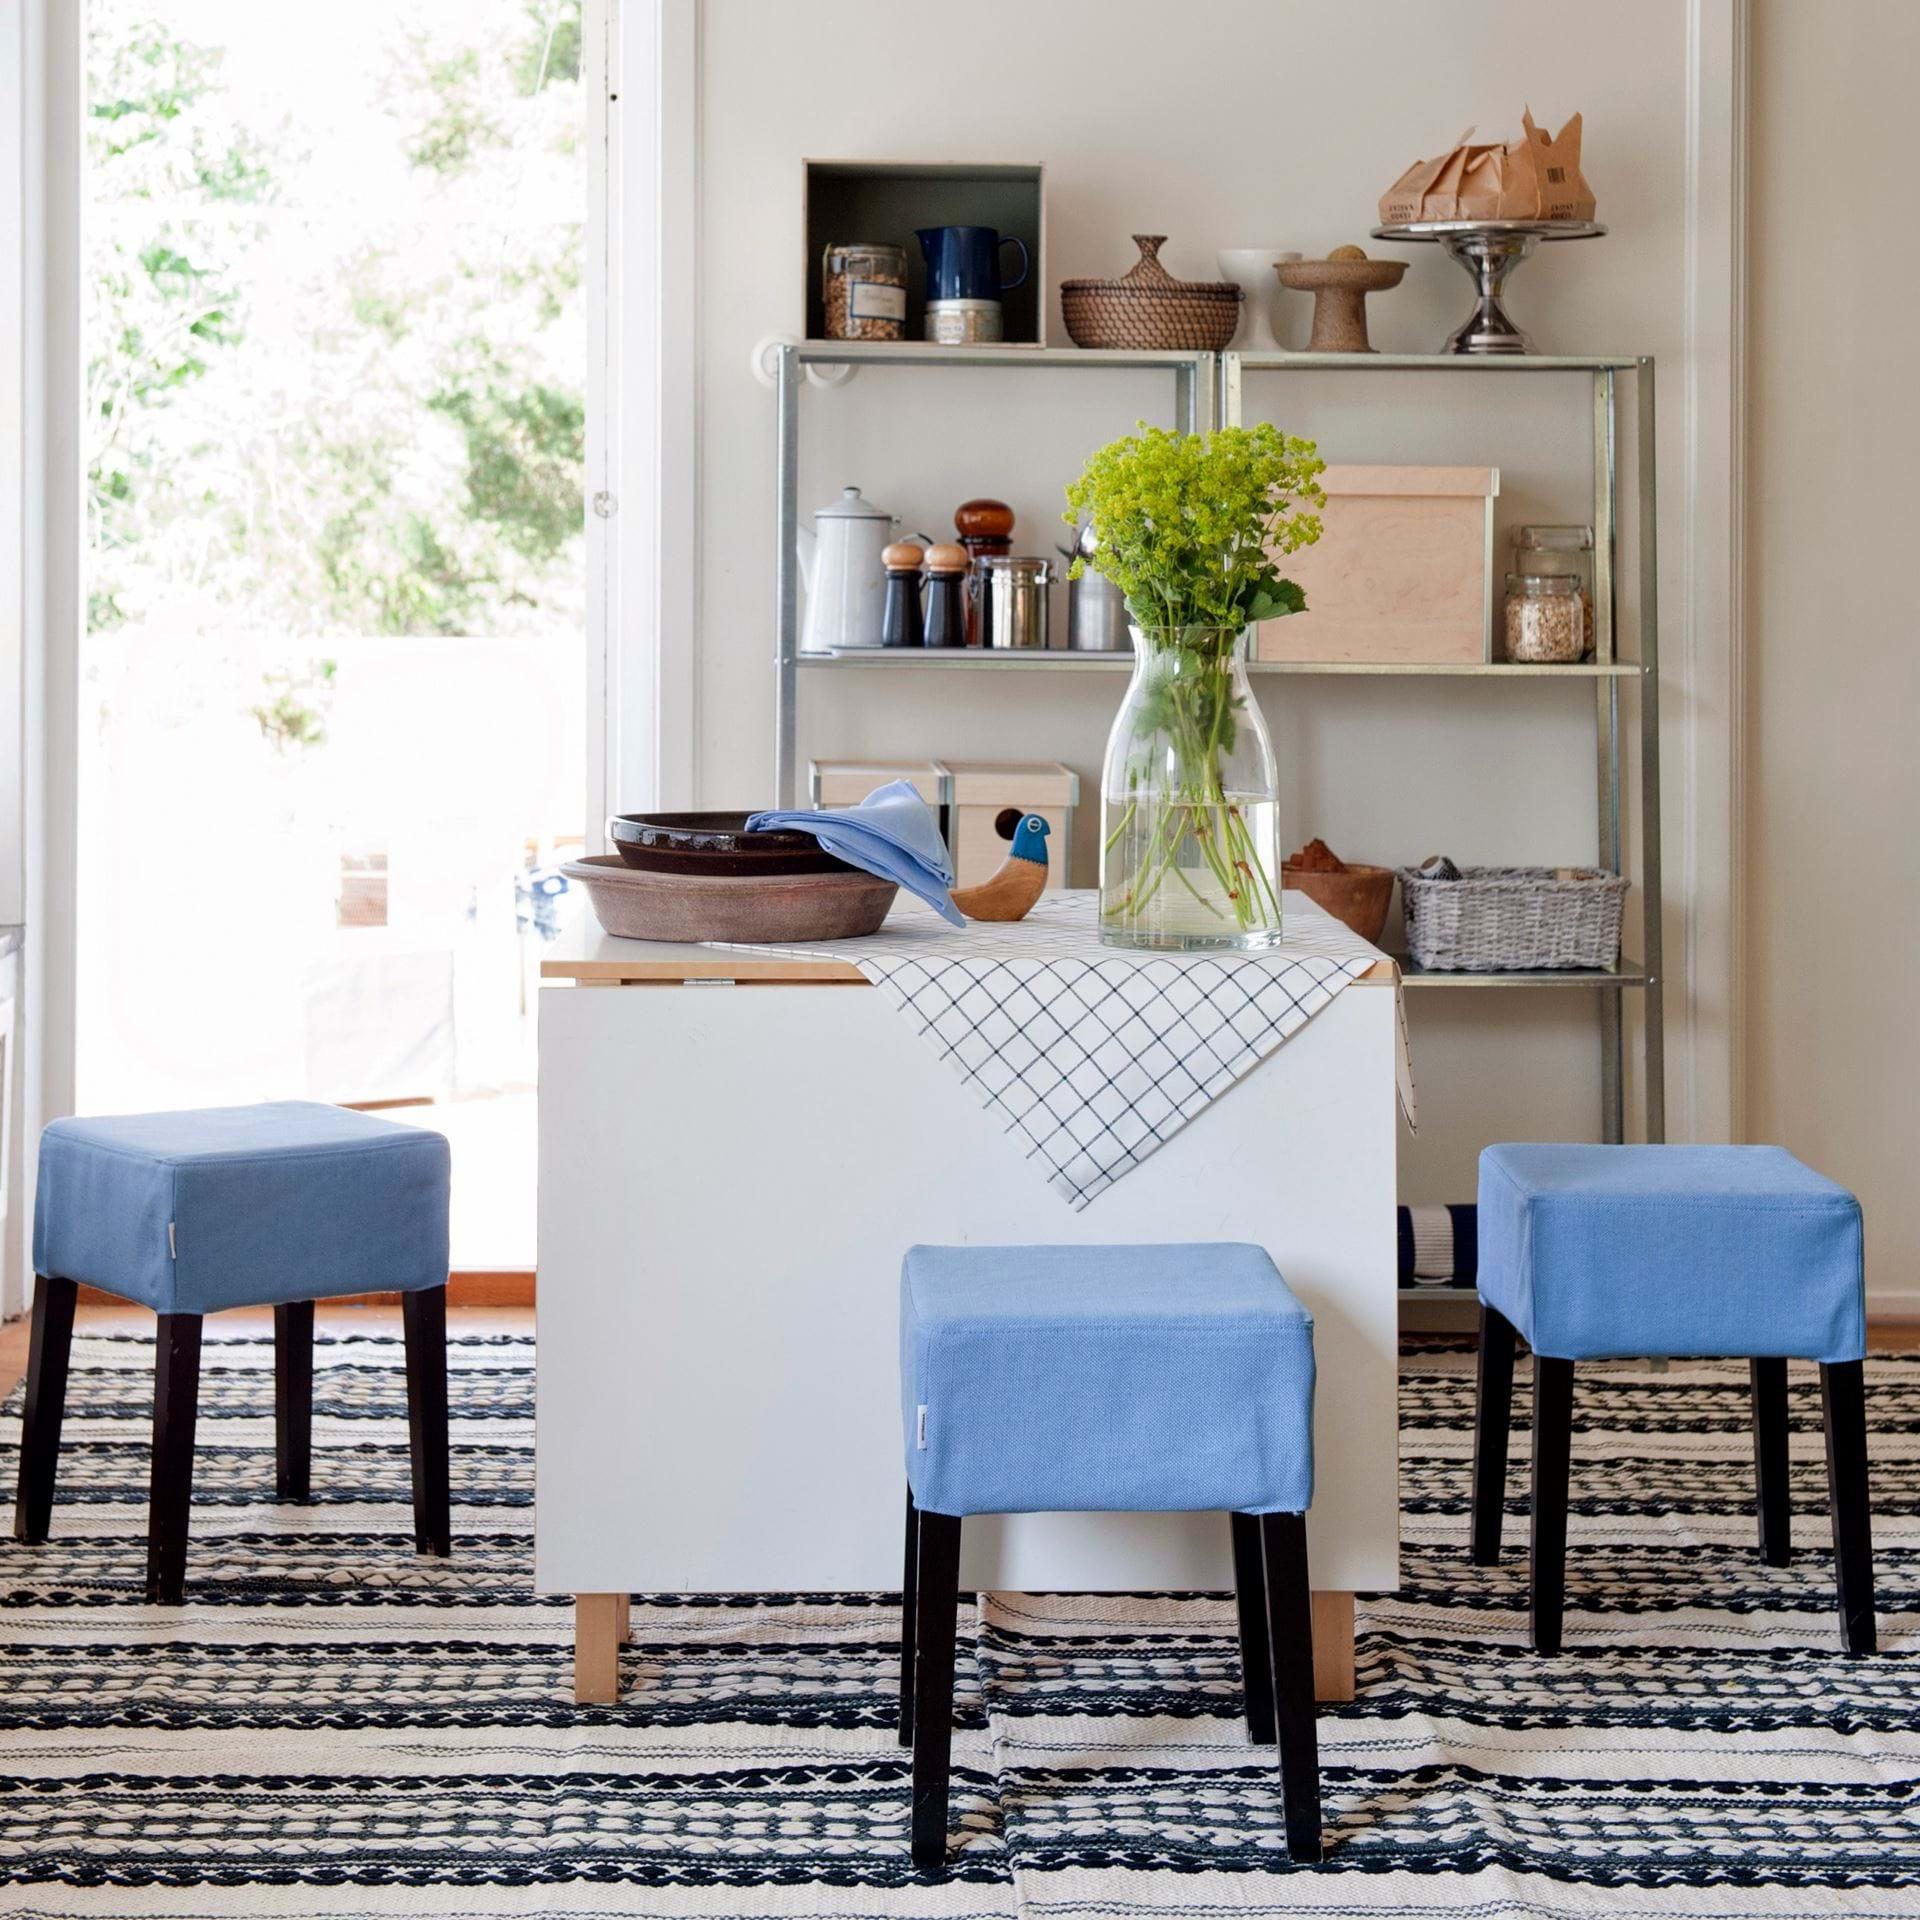 Groovy Ikea Nils Stool Cover Bemz Bemz Pdpeps Interior Chair Design Pdpepsorg